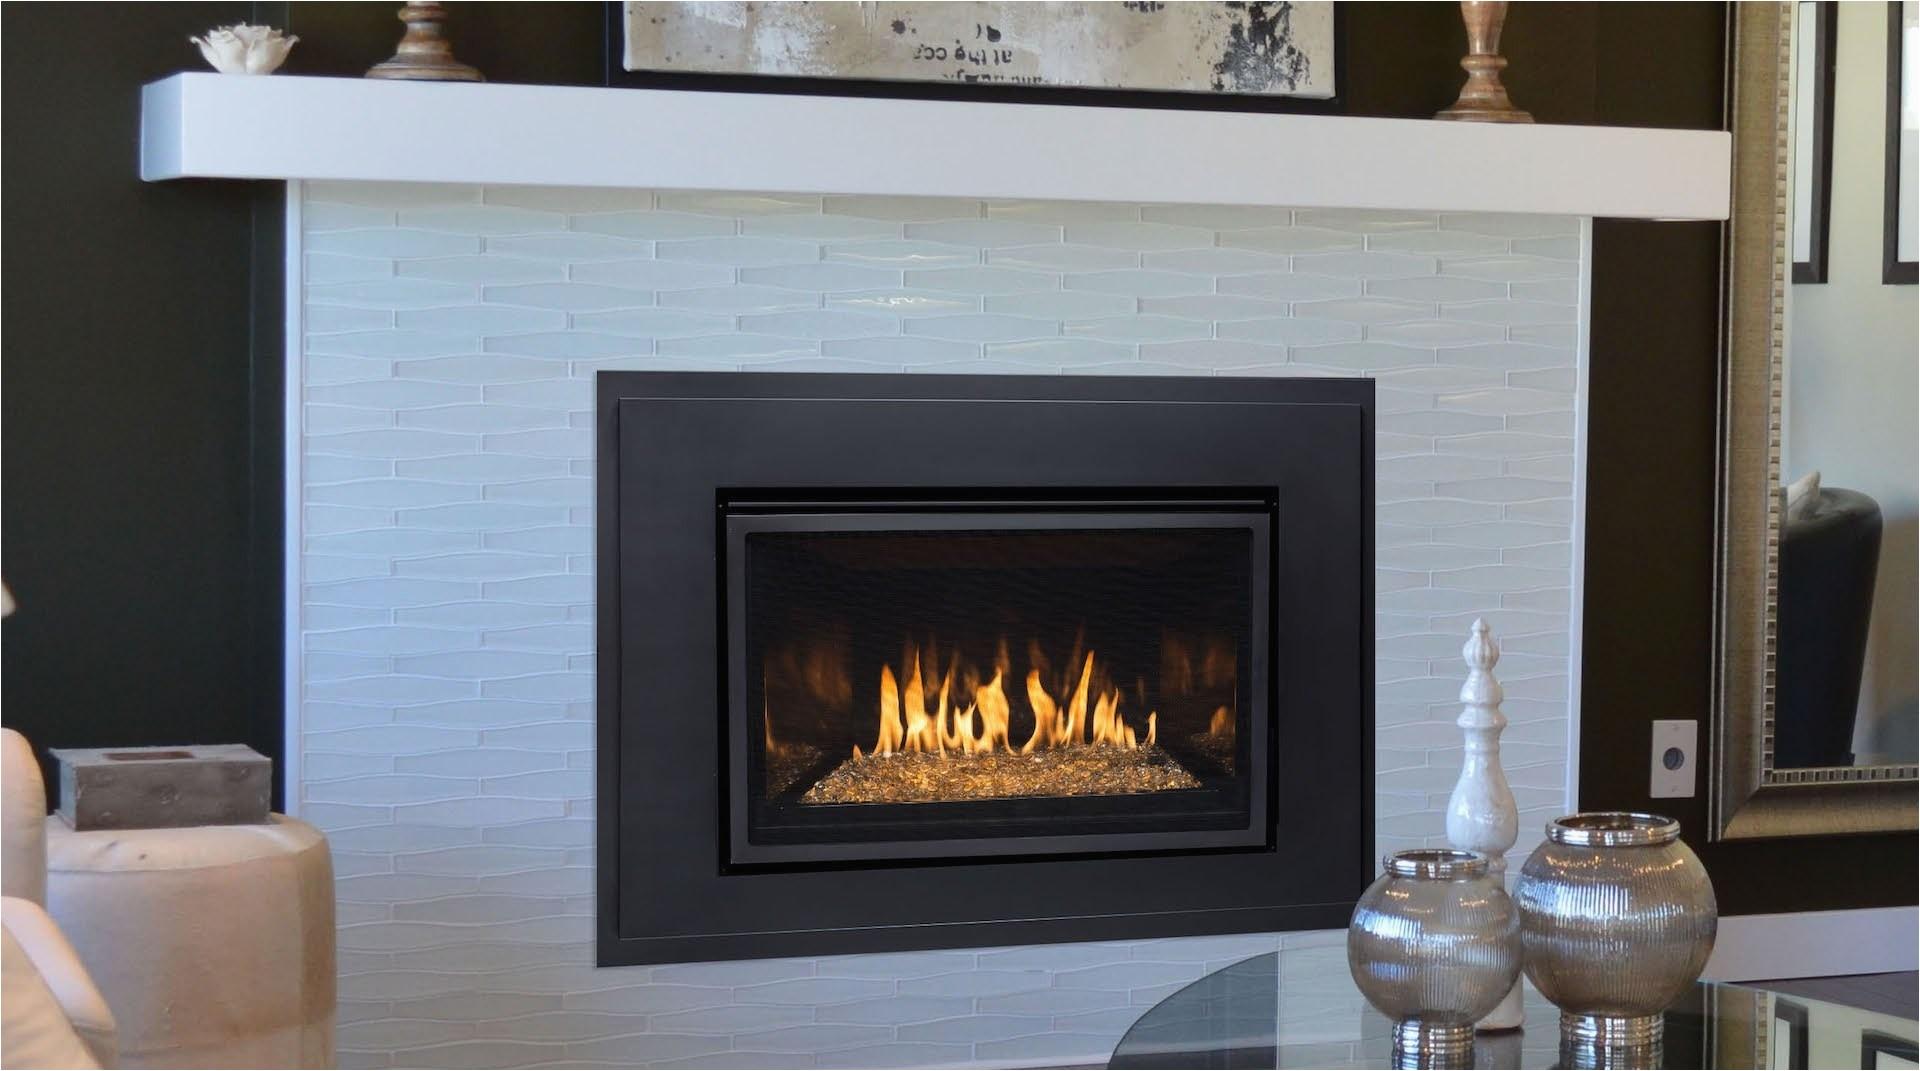 outdoor gas fireplace insert elegant montigo 34fid gas fireplace insert inseason fireplaces stoves